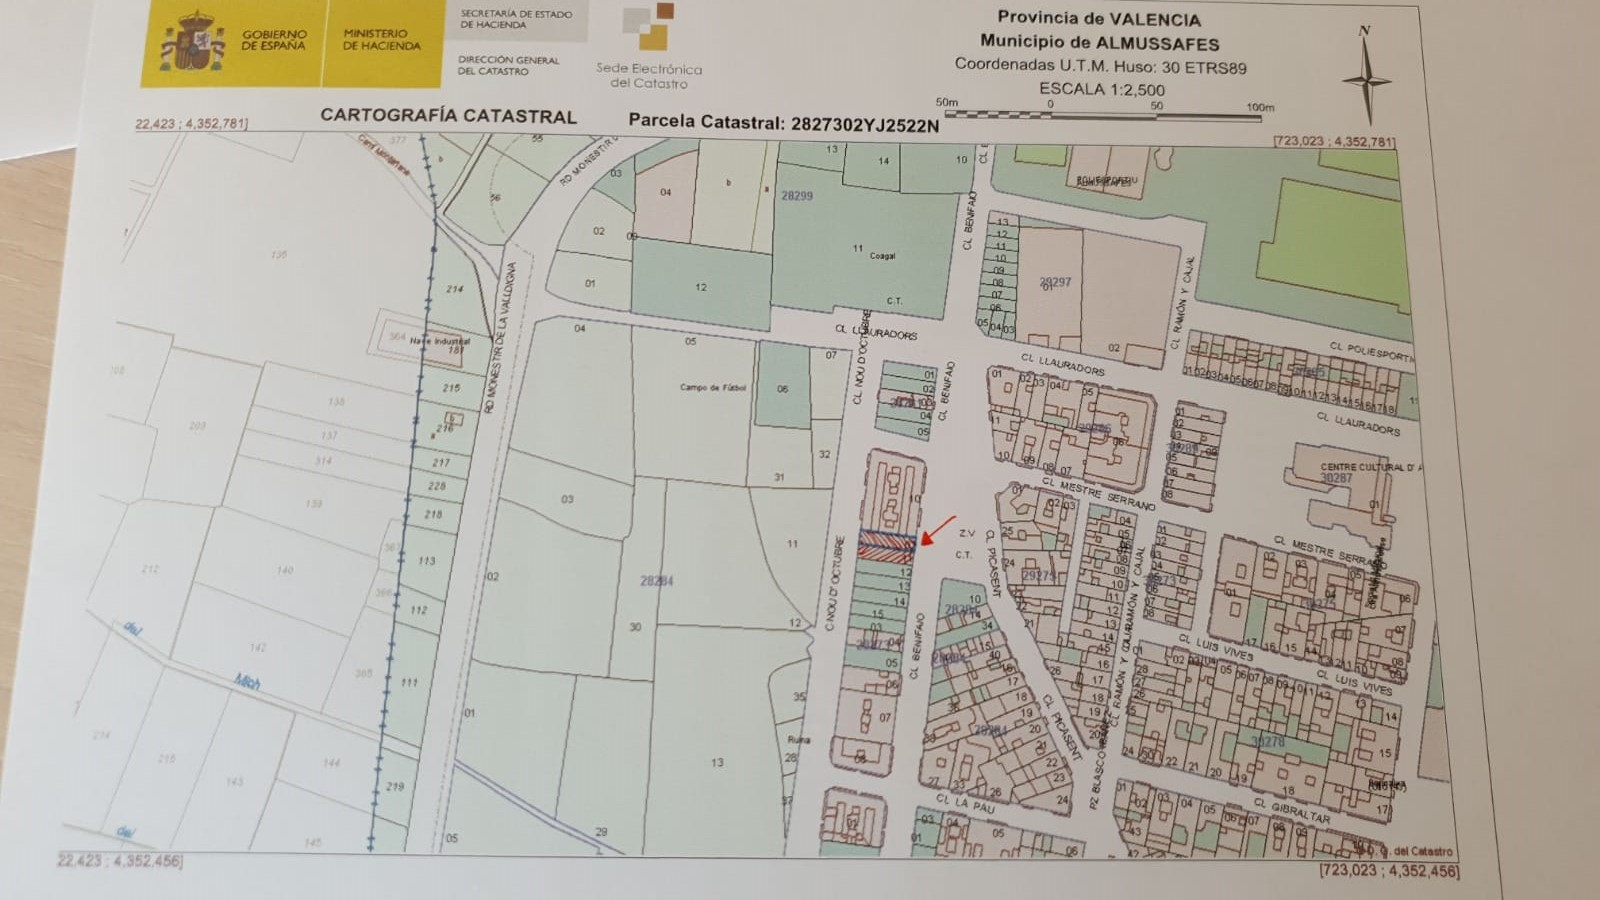 Stadtgrundstück  Calle nou d,octubre y benifaio. Se vende solar urbanizado en almussafes